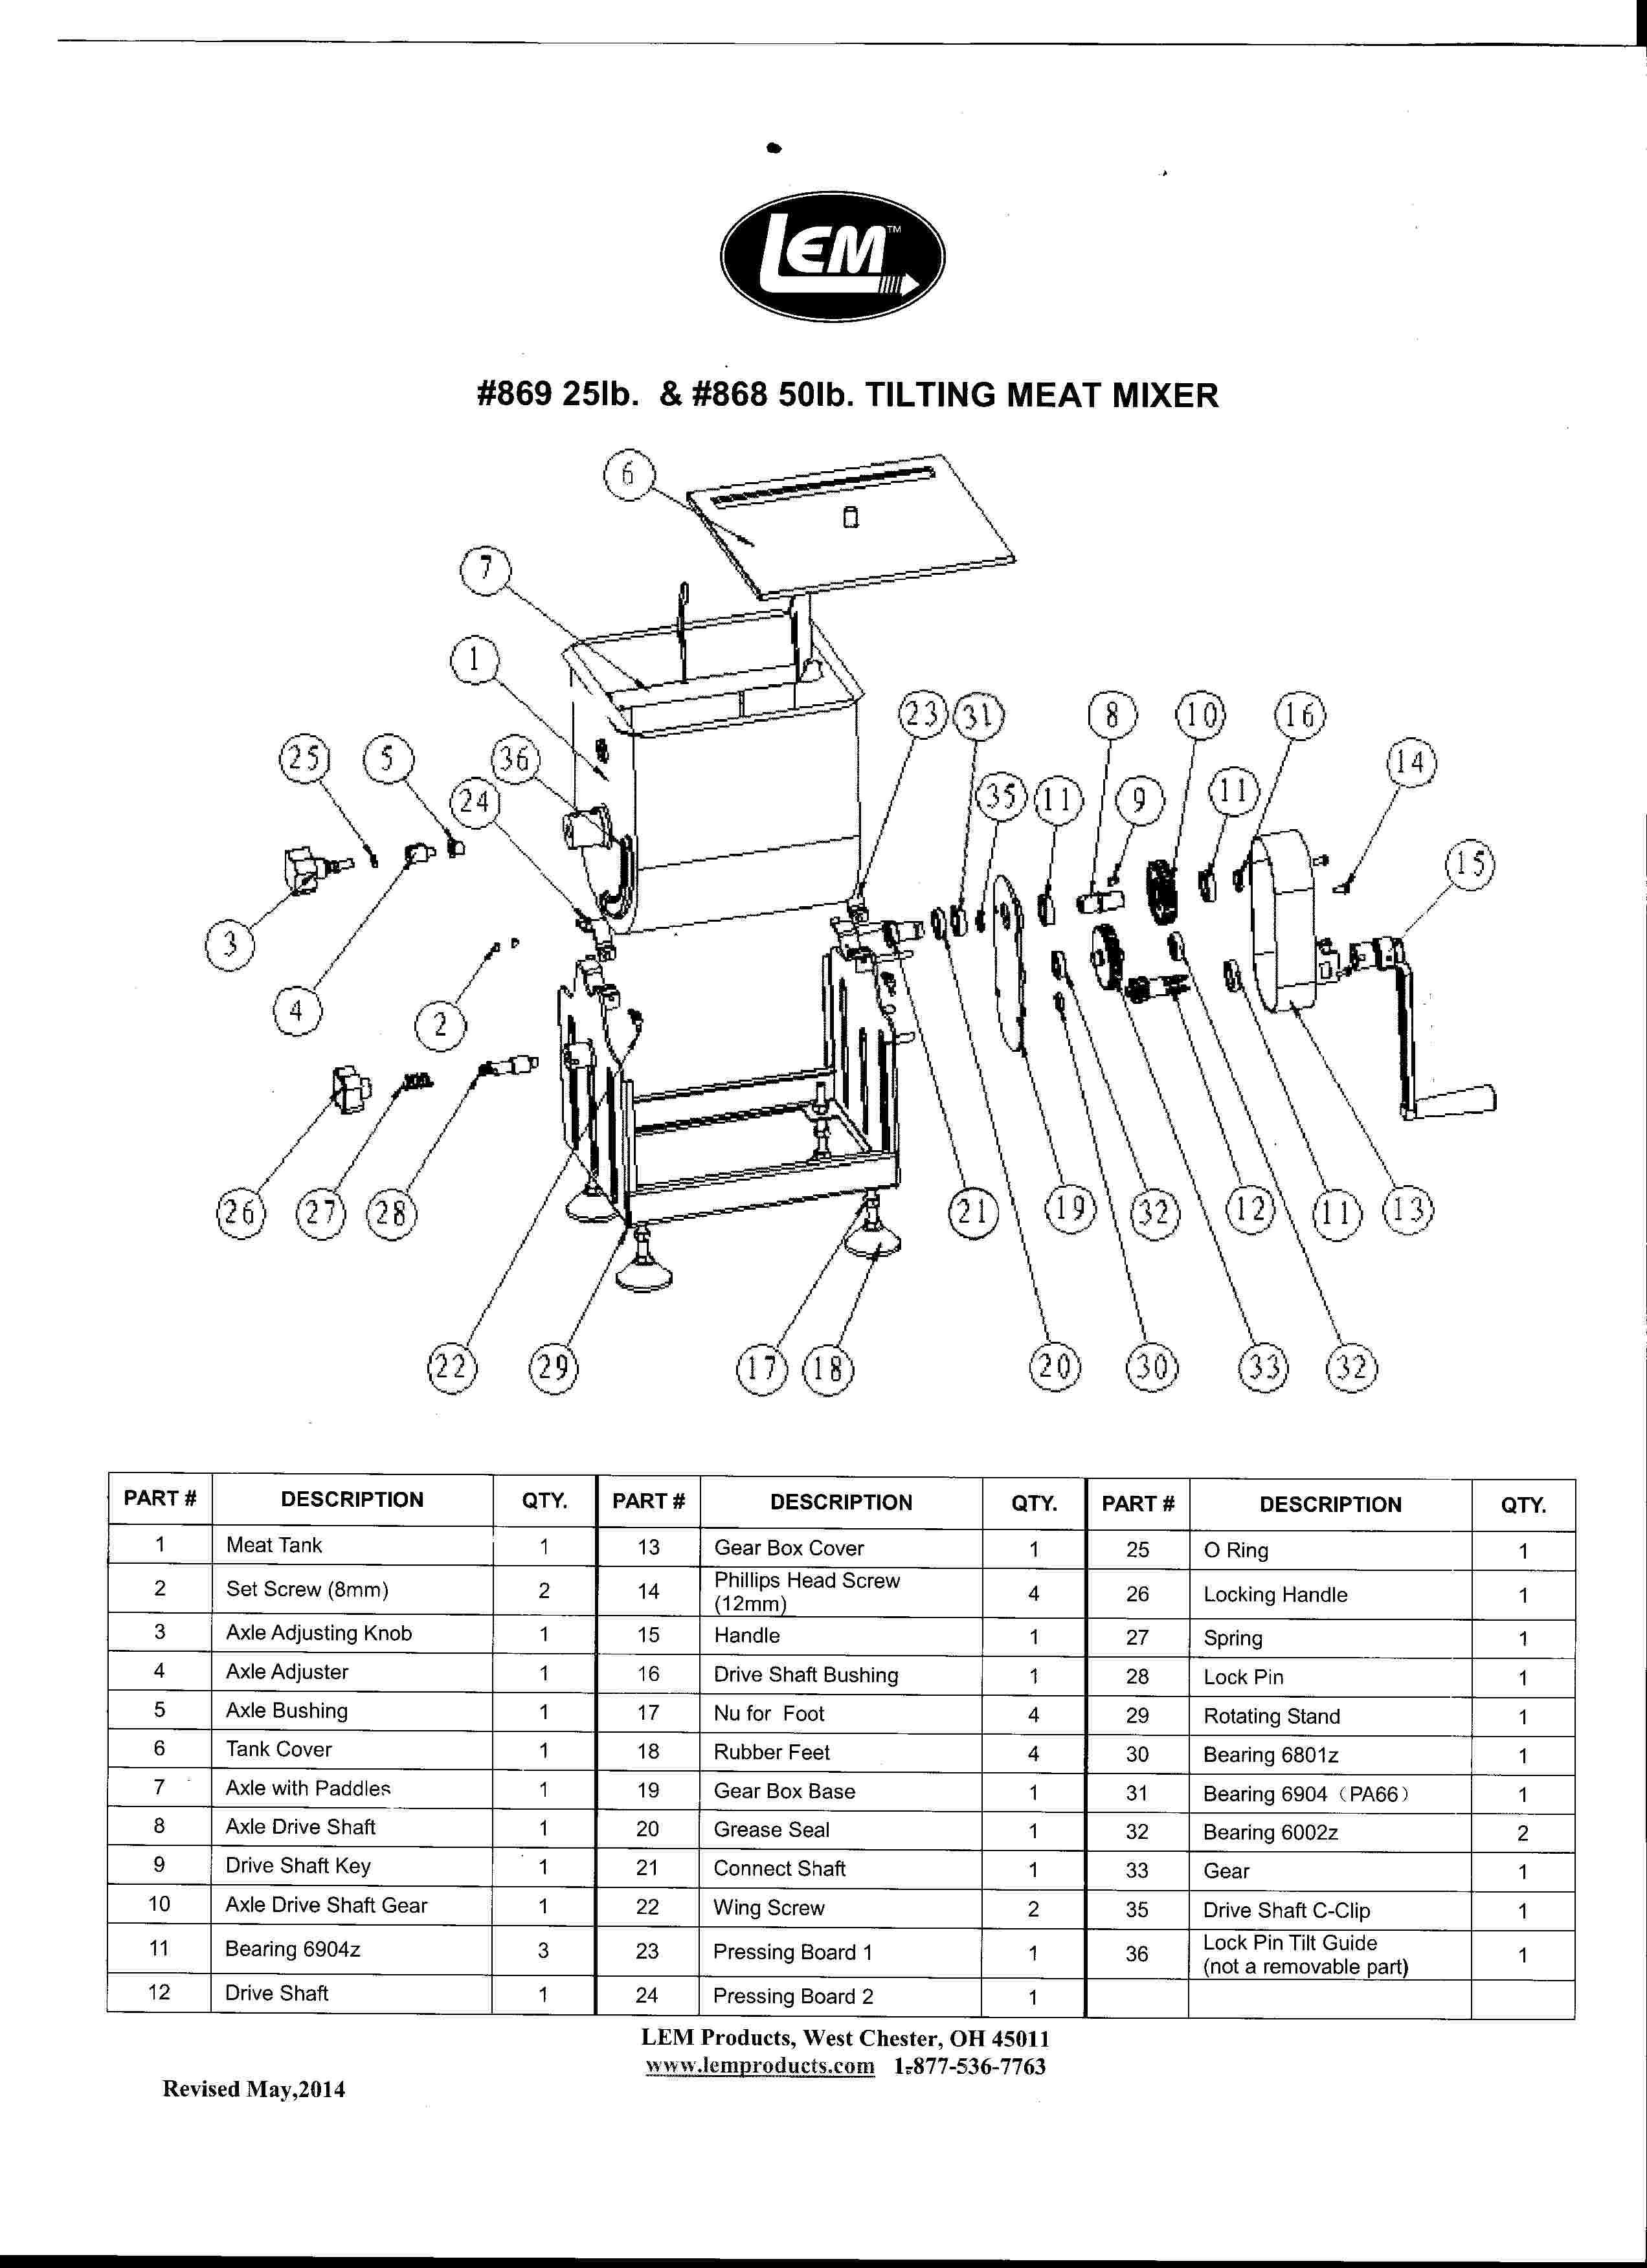 Manual for 50 lb. LEM Meat Mixer